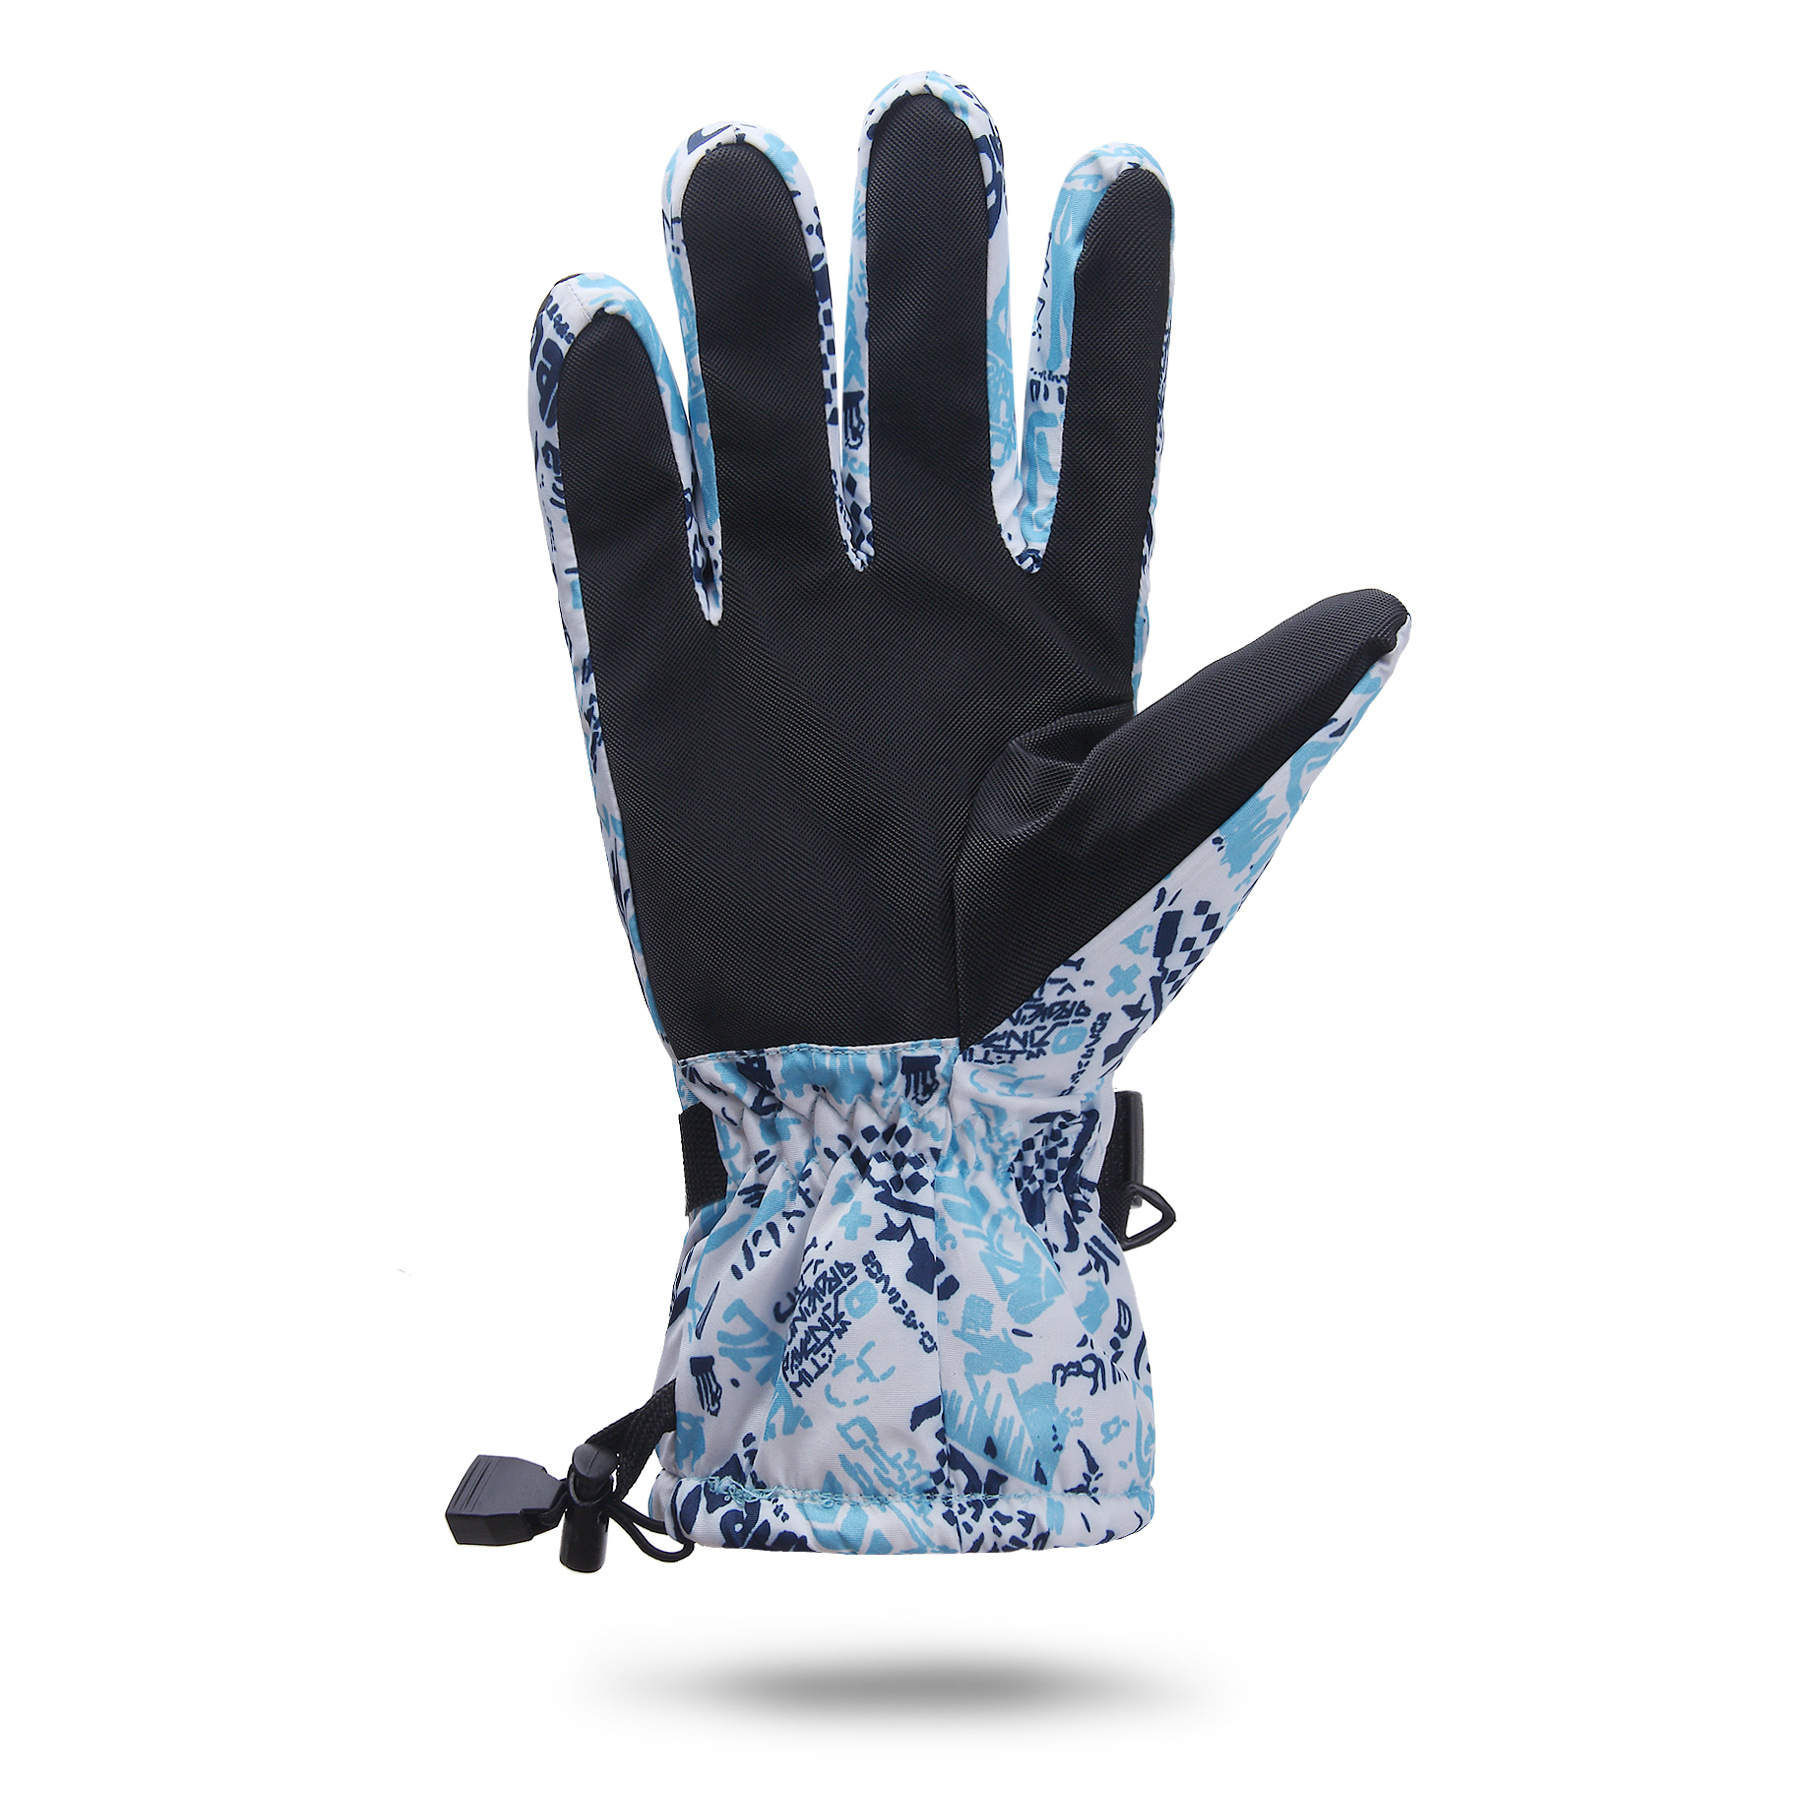 2016 Winter Gloves Ski Waterproof Windstopper Gloves Hot SaleSnowboard Warm Skiing Riding Climbing Snowmobile Gloves